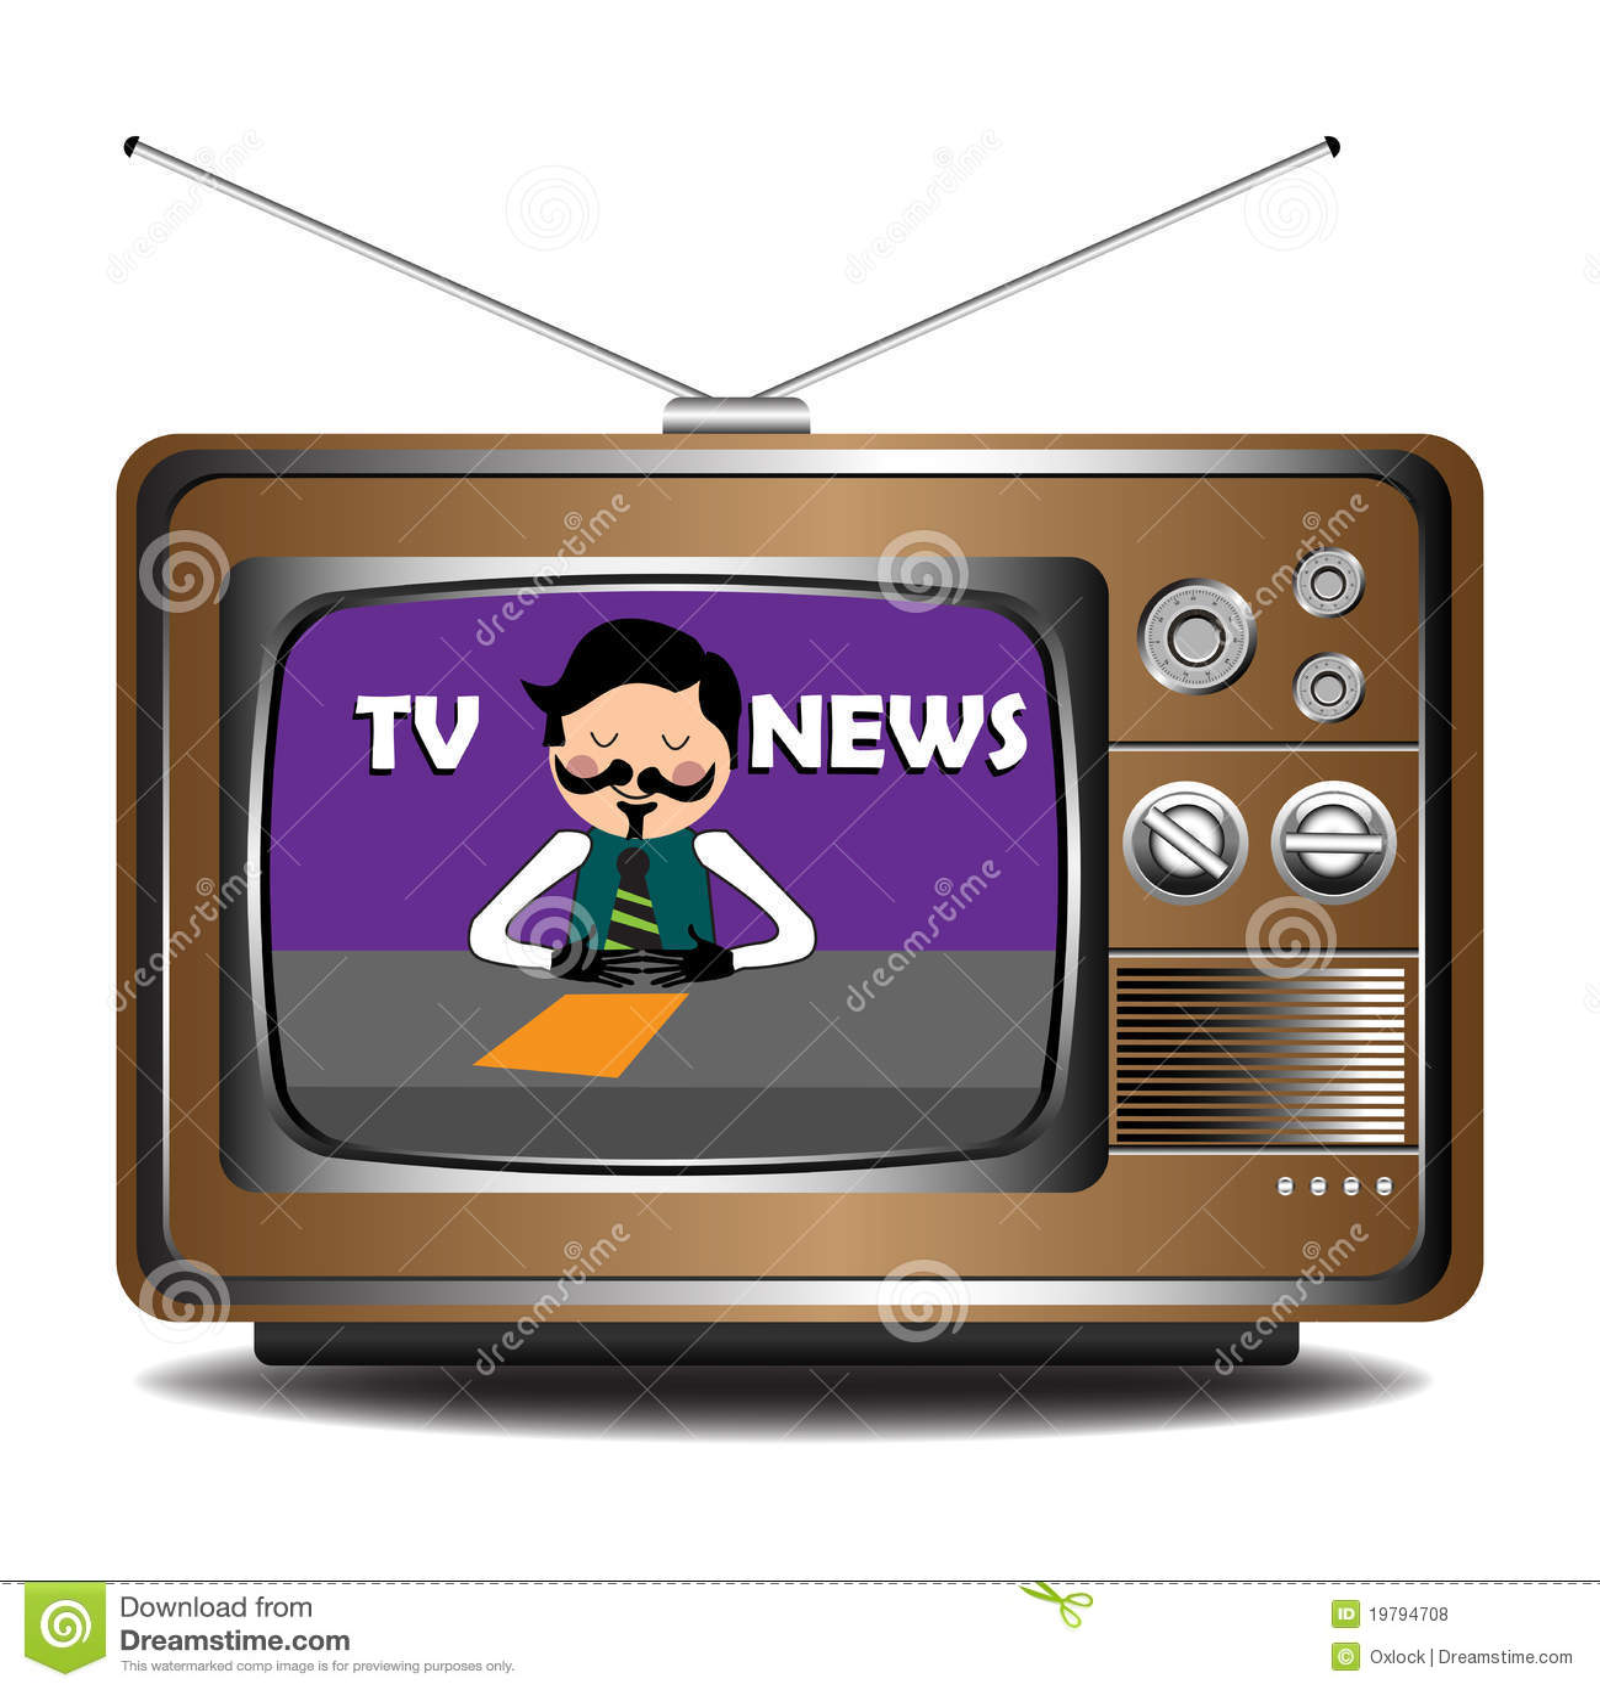 Download TV News Stock Vector Illustration Of Multimedia Mustache